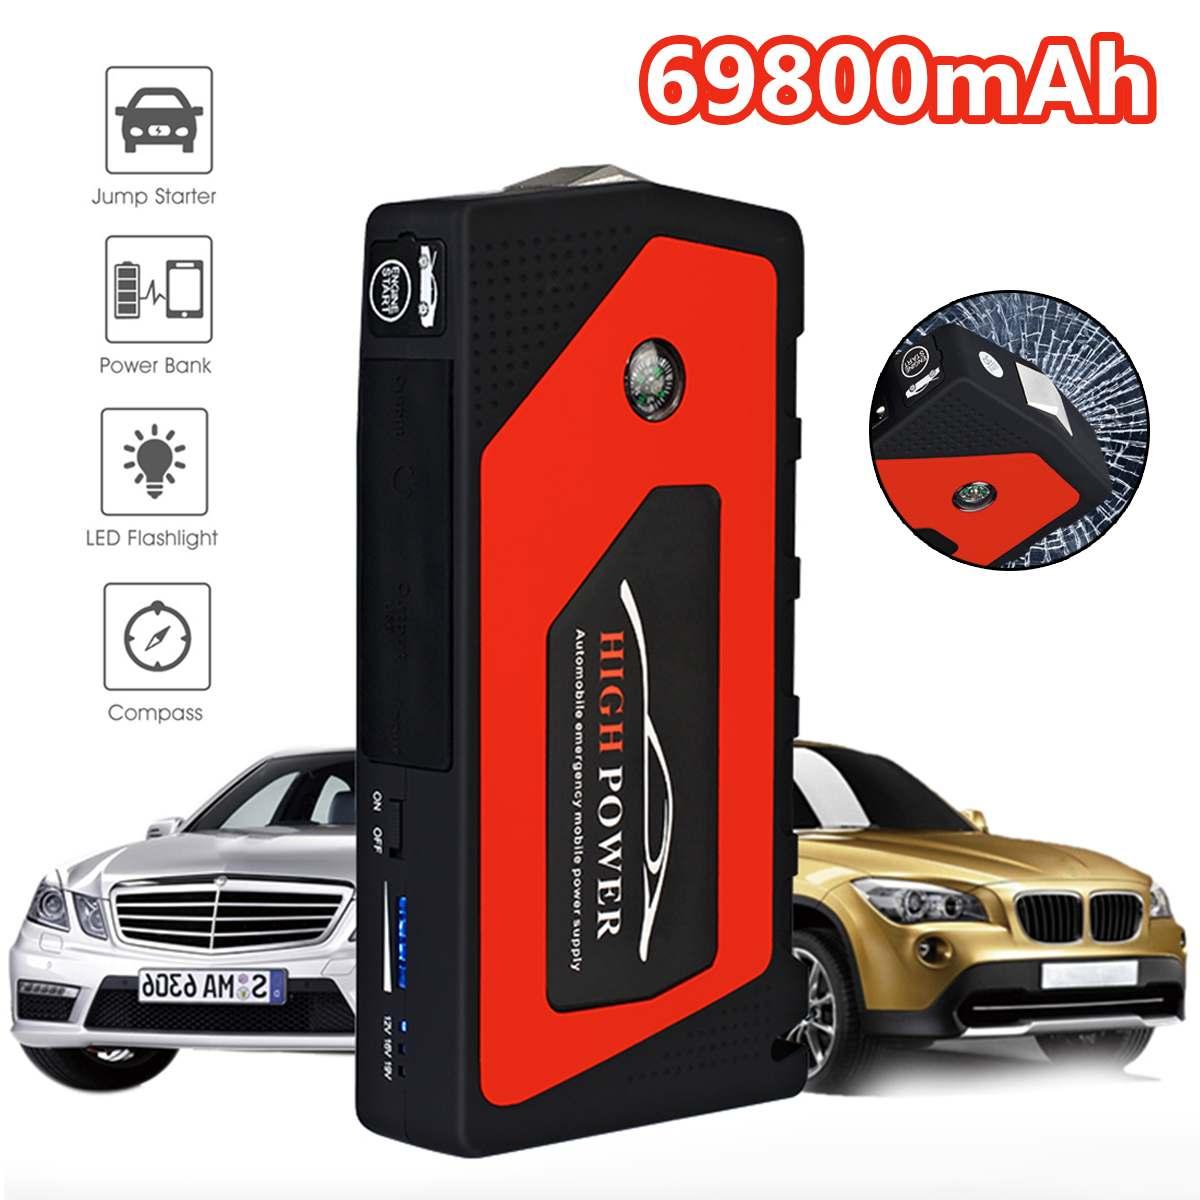 car-jump-starter-emergency-69800mah-12v-starting-device-4usb-sos-light-mobile-power-bank-car-charger-for-car-battery-booster-led